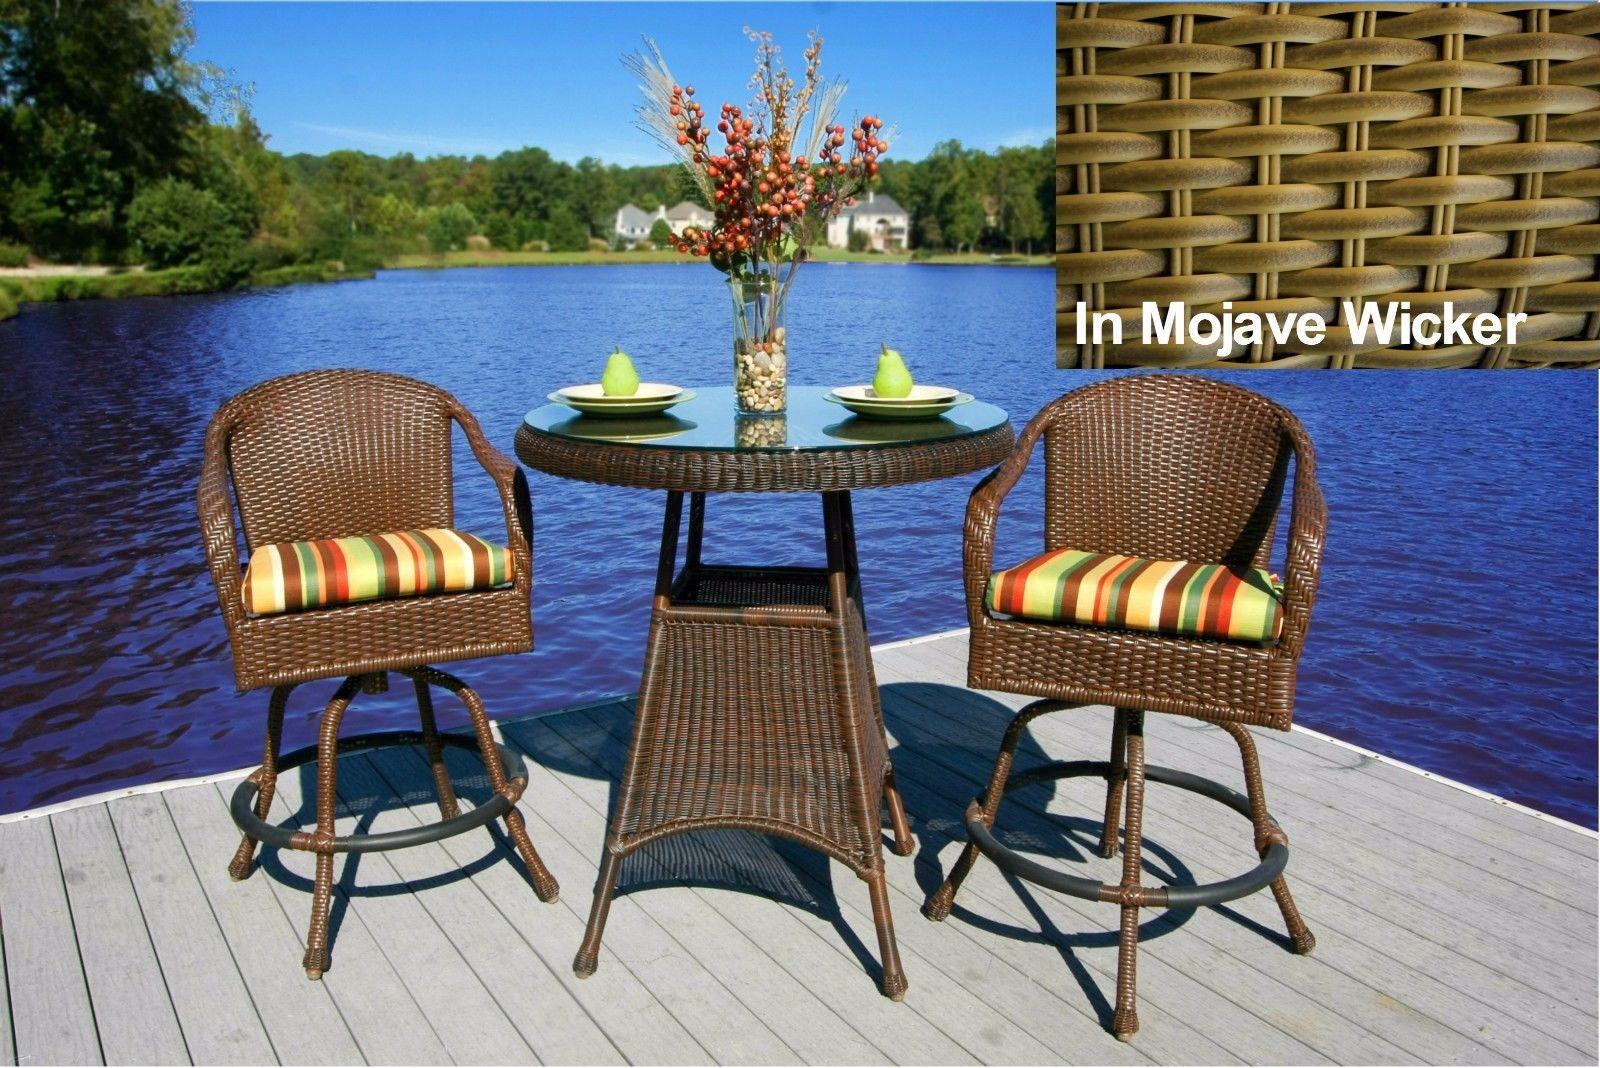 #198 - 3 Piece Outdoor Patio Garden Furniture in Mojave Color Wicker Bar Set